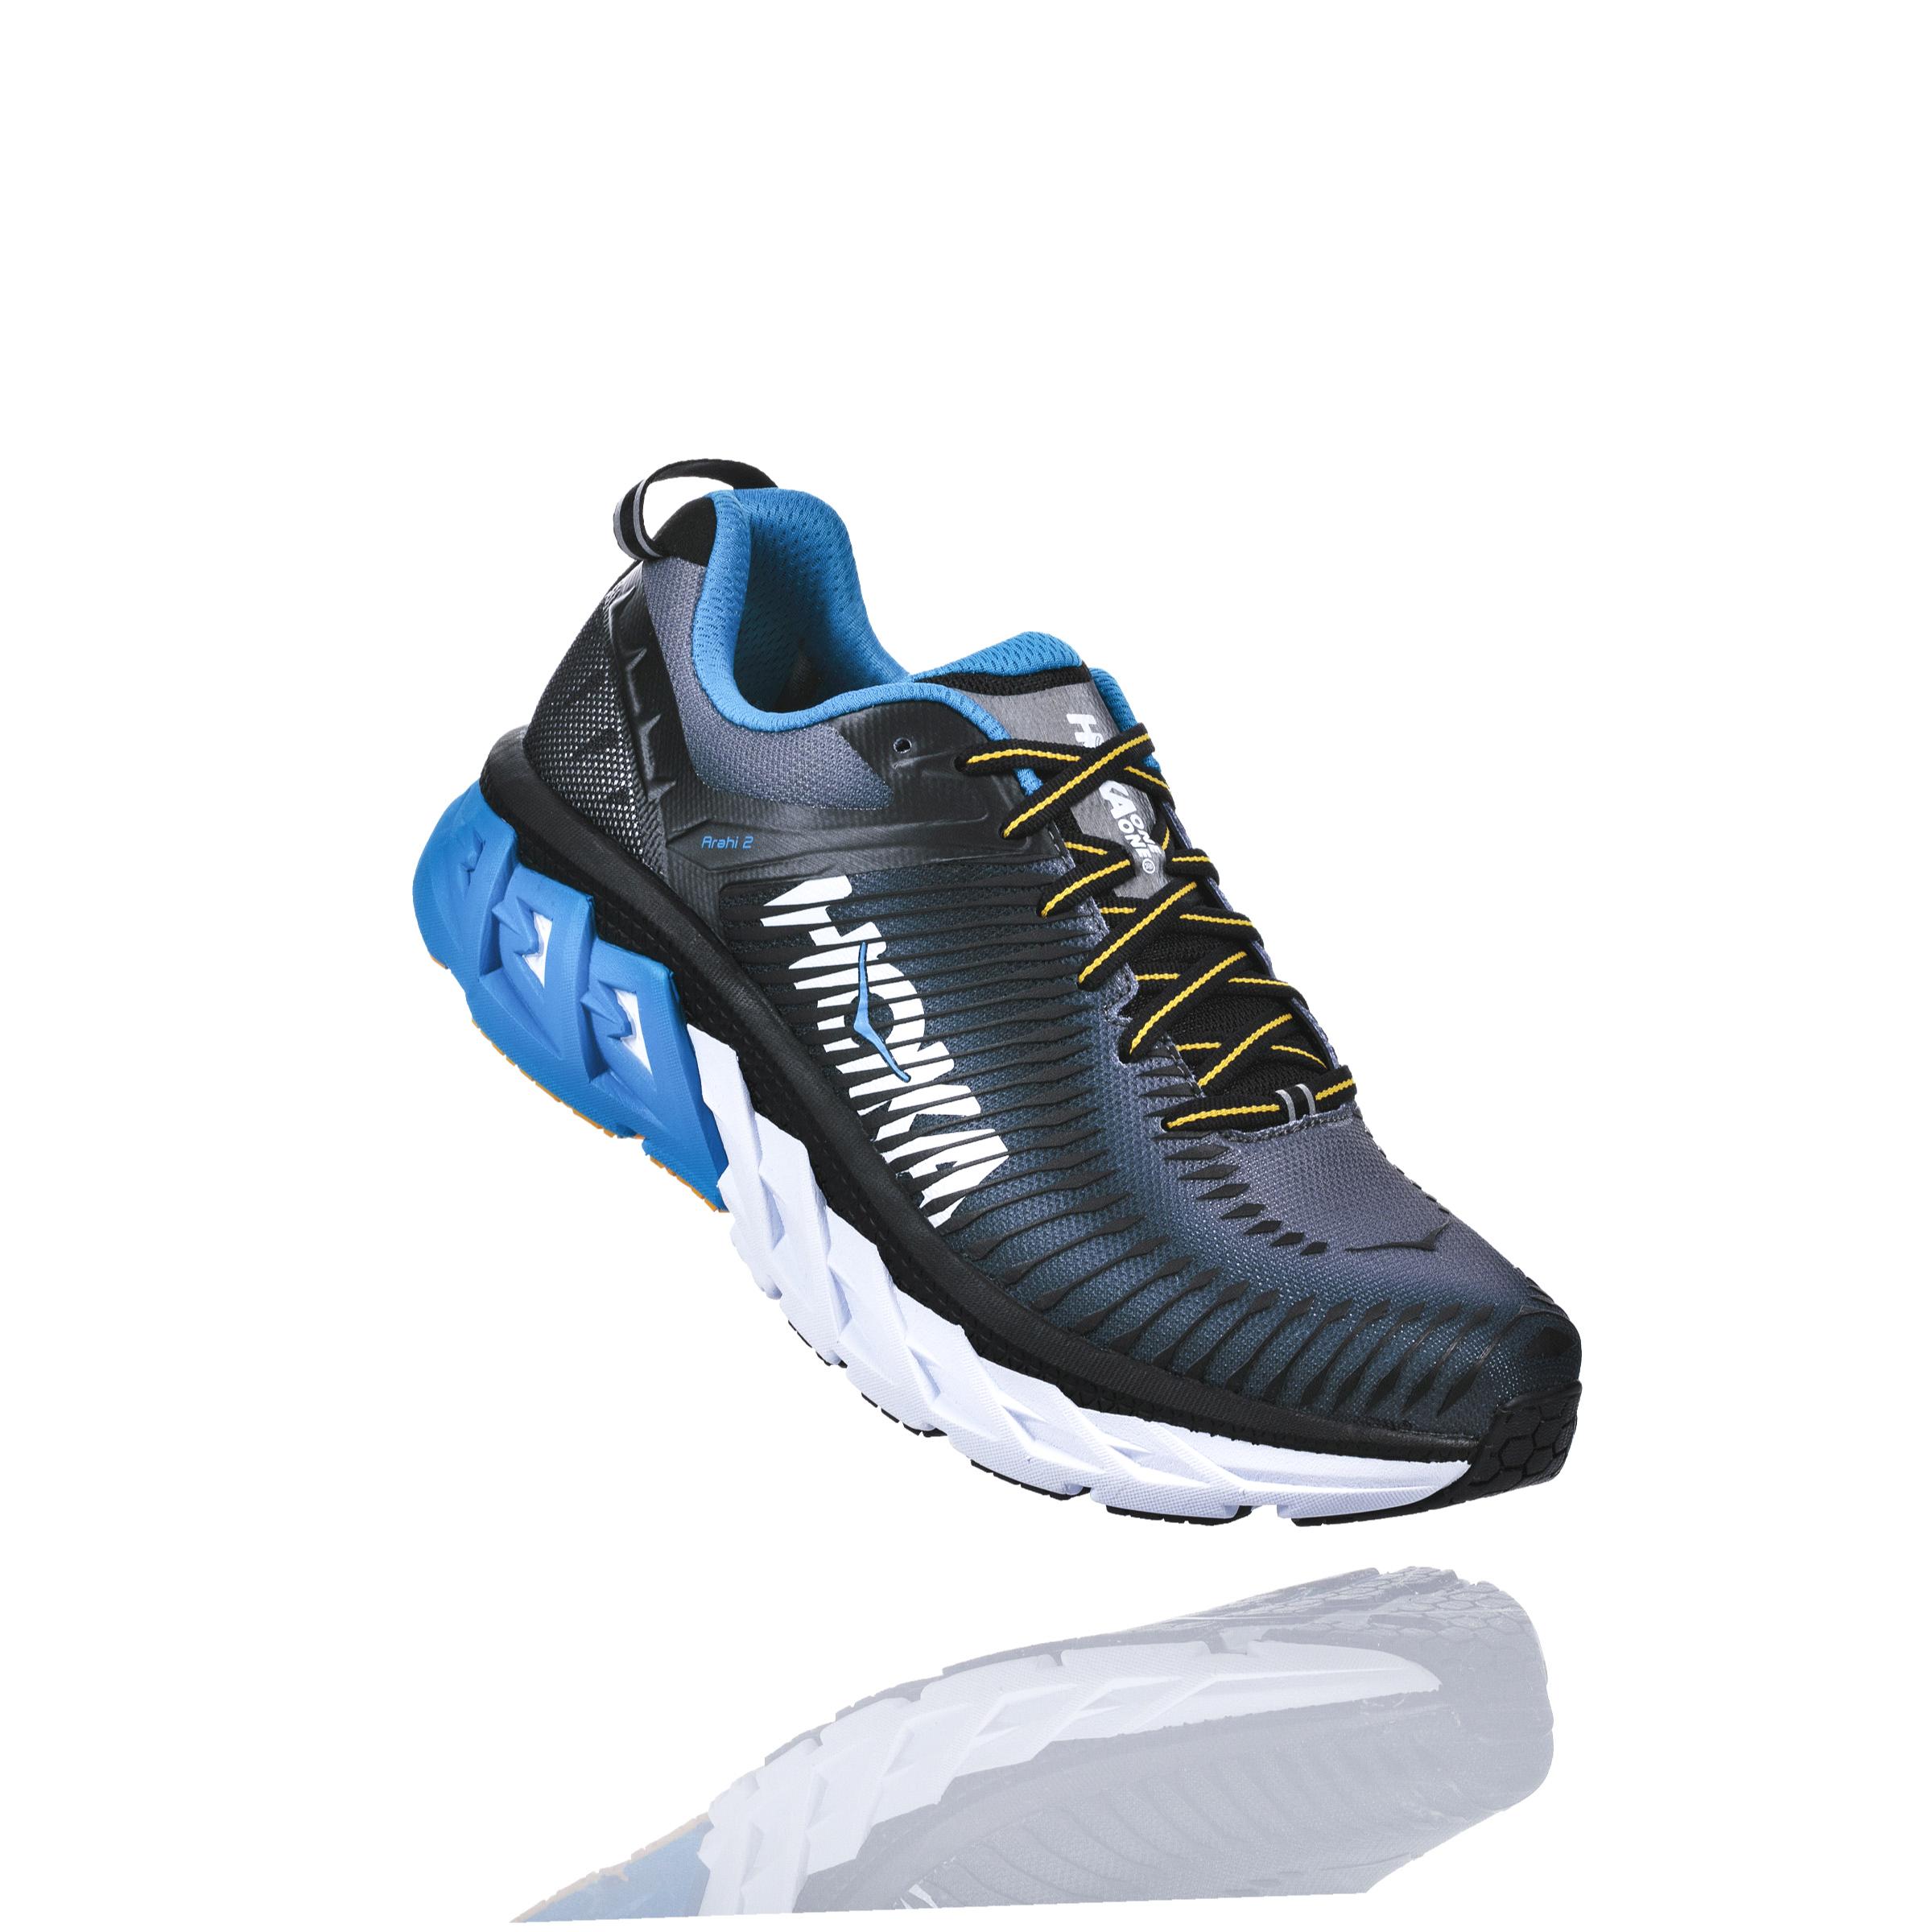 Men's Arahi 2 - Hoka One One Athletic Shoes-Hoka One One